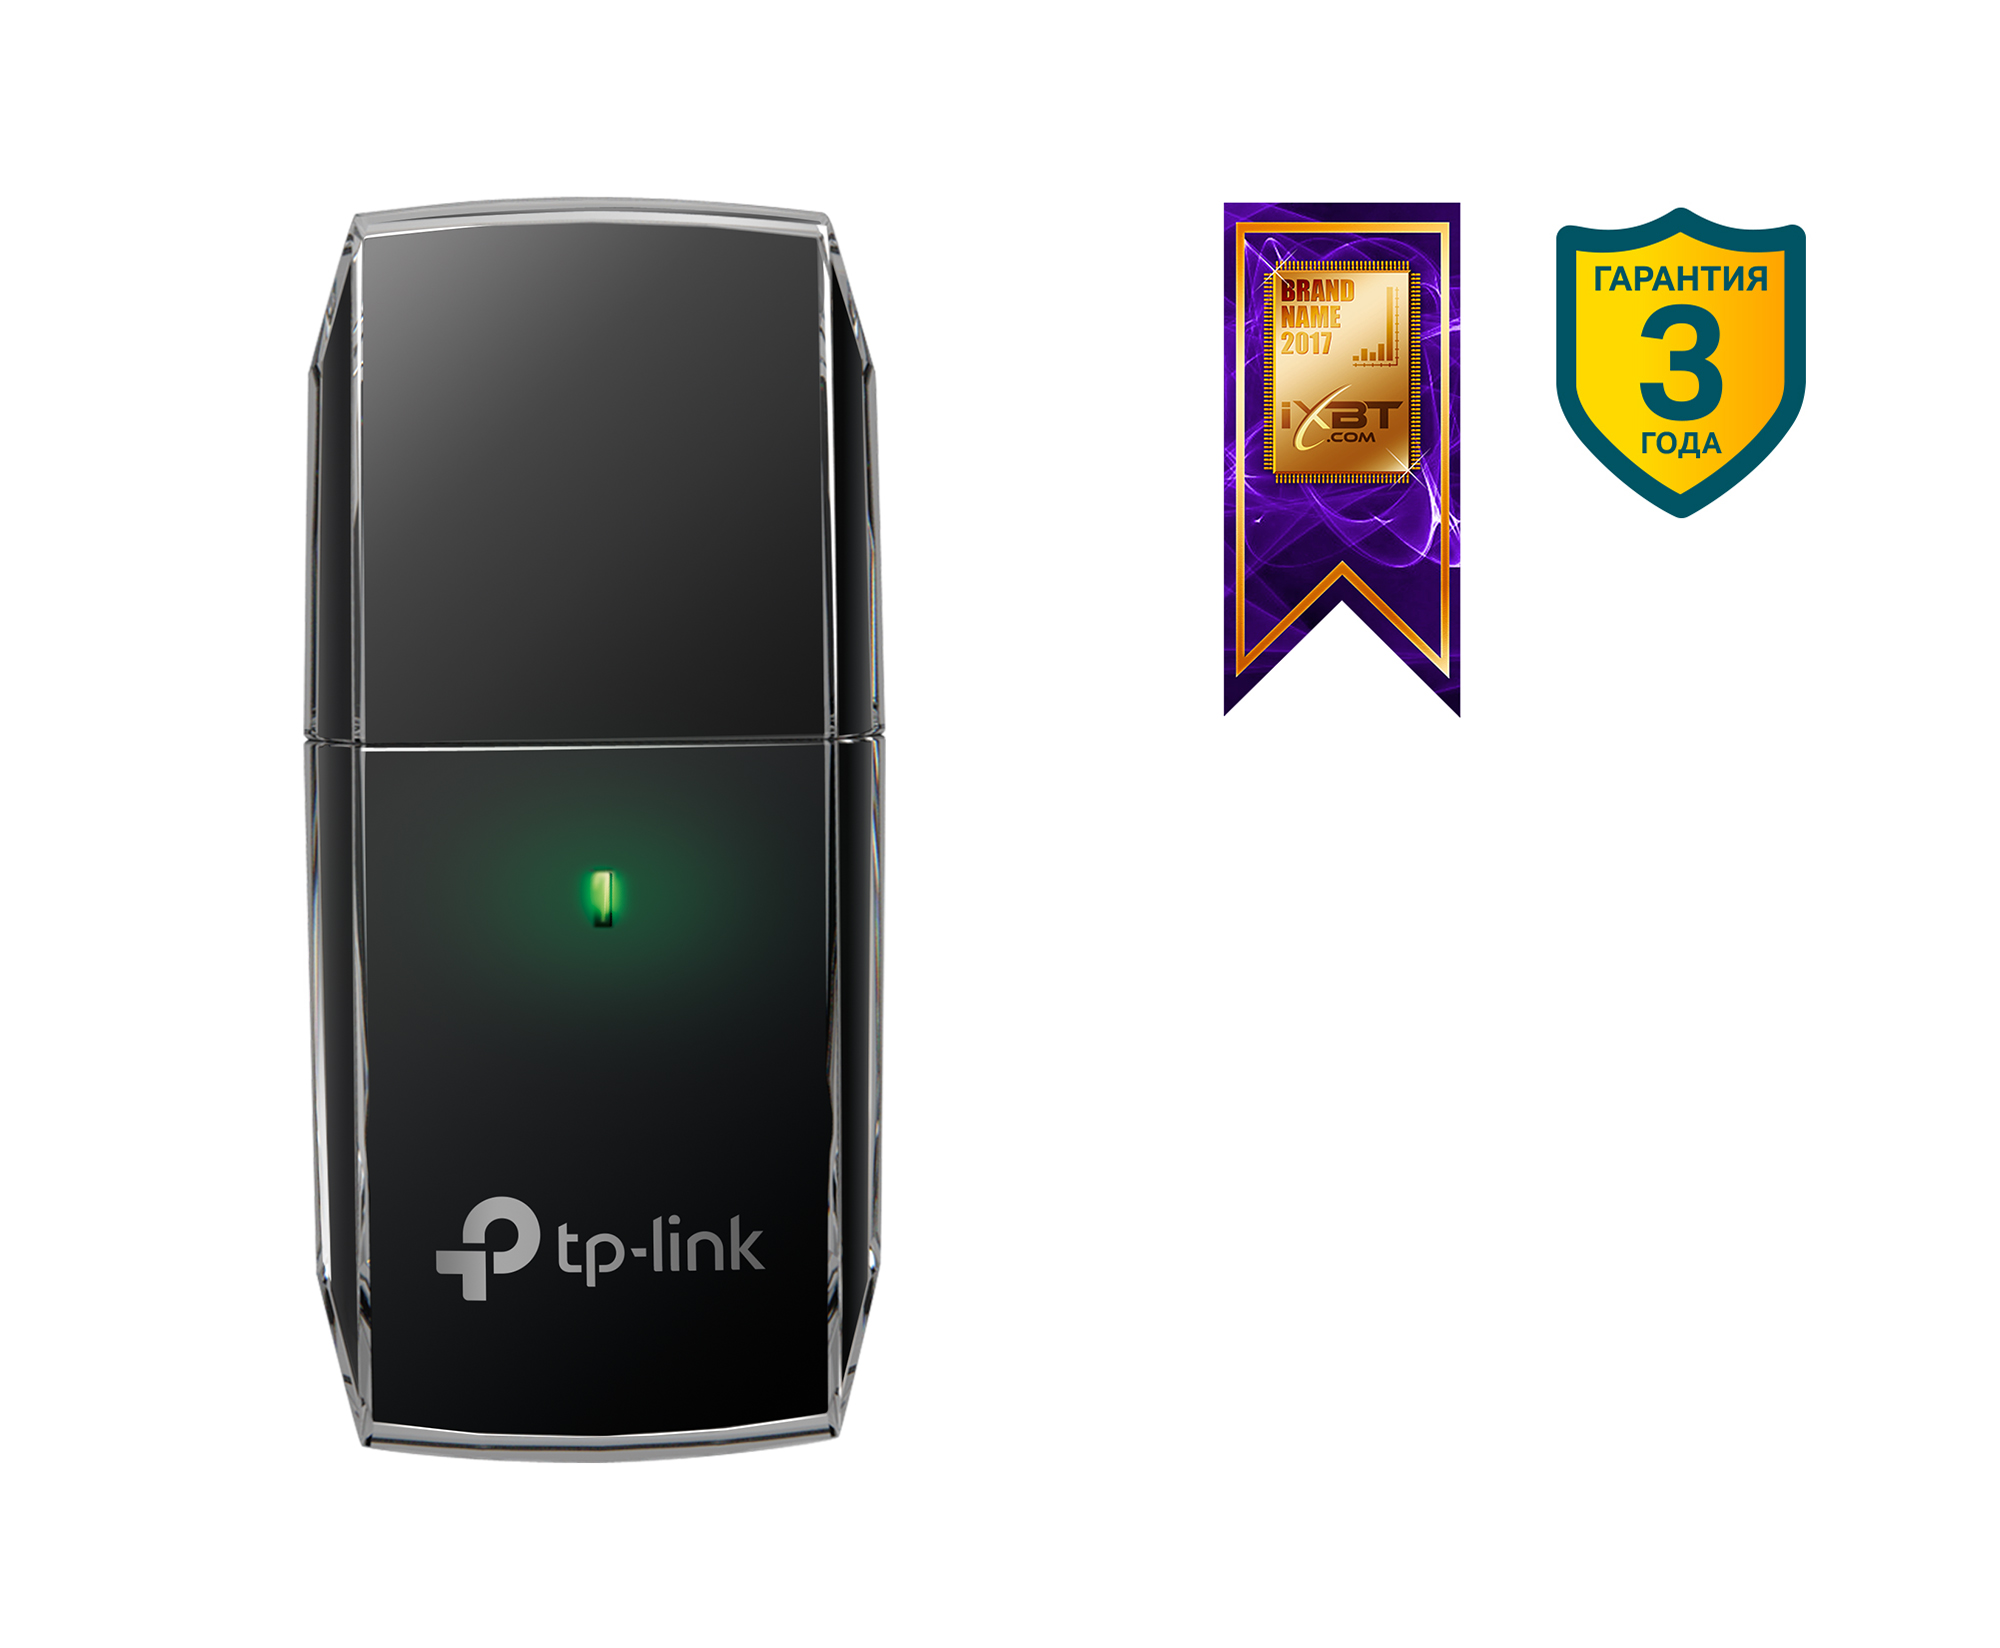 Беспроводной Wi-Fi адаптер TP-LINK Archer T2U 802.11acbgn, 150/433Mbps, 2.4/5GHz, USB беспроводной wi fi адаптер tp link archer t4u ac1300 802 11acbgn 867mbps 2 4 5ghz usb